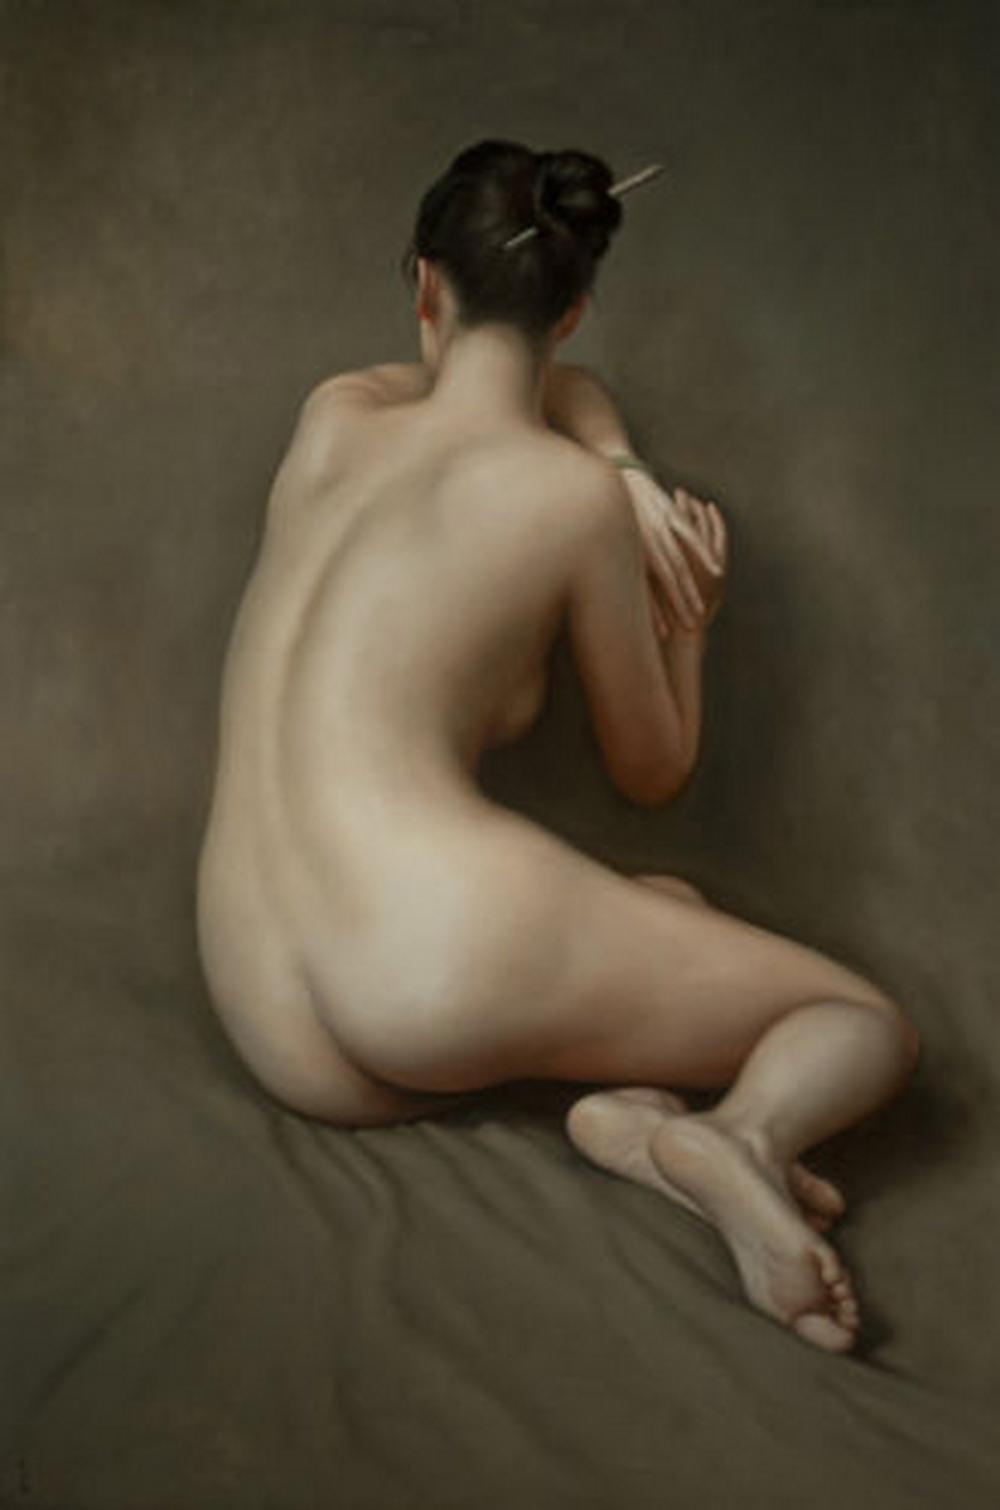 fake-pinoy-nude-artist-topps